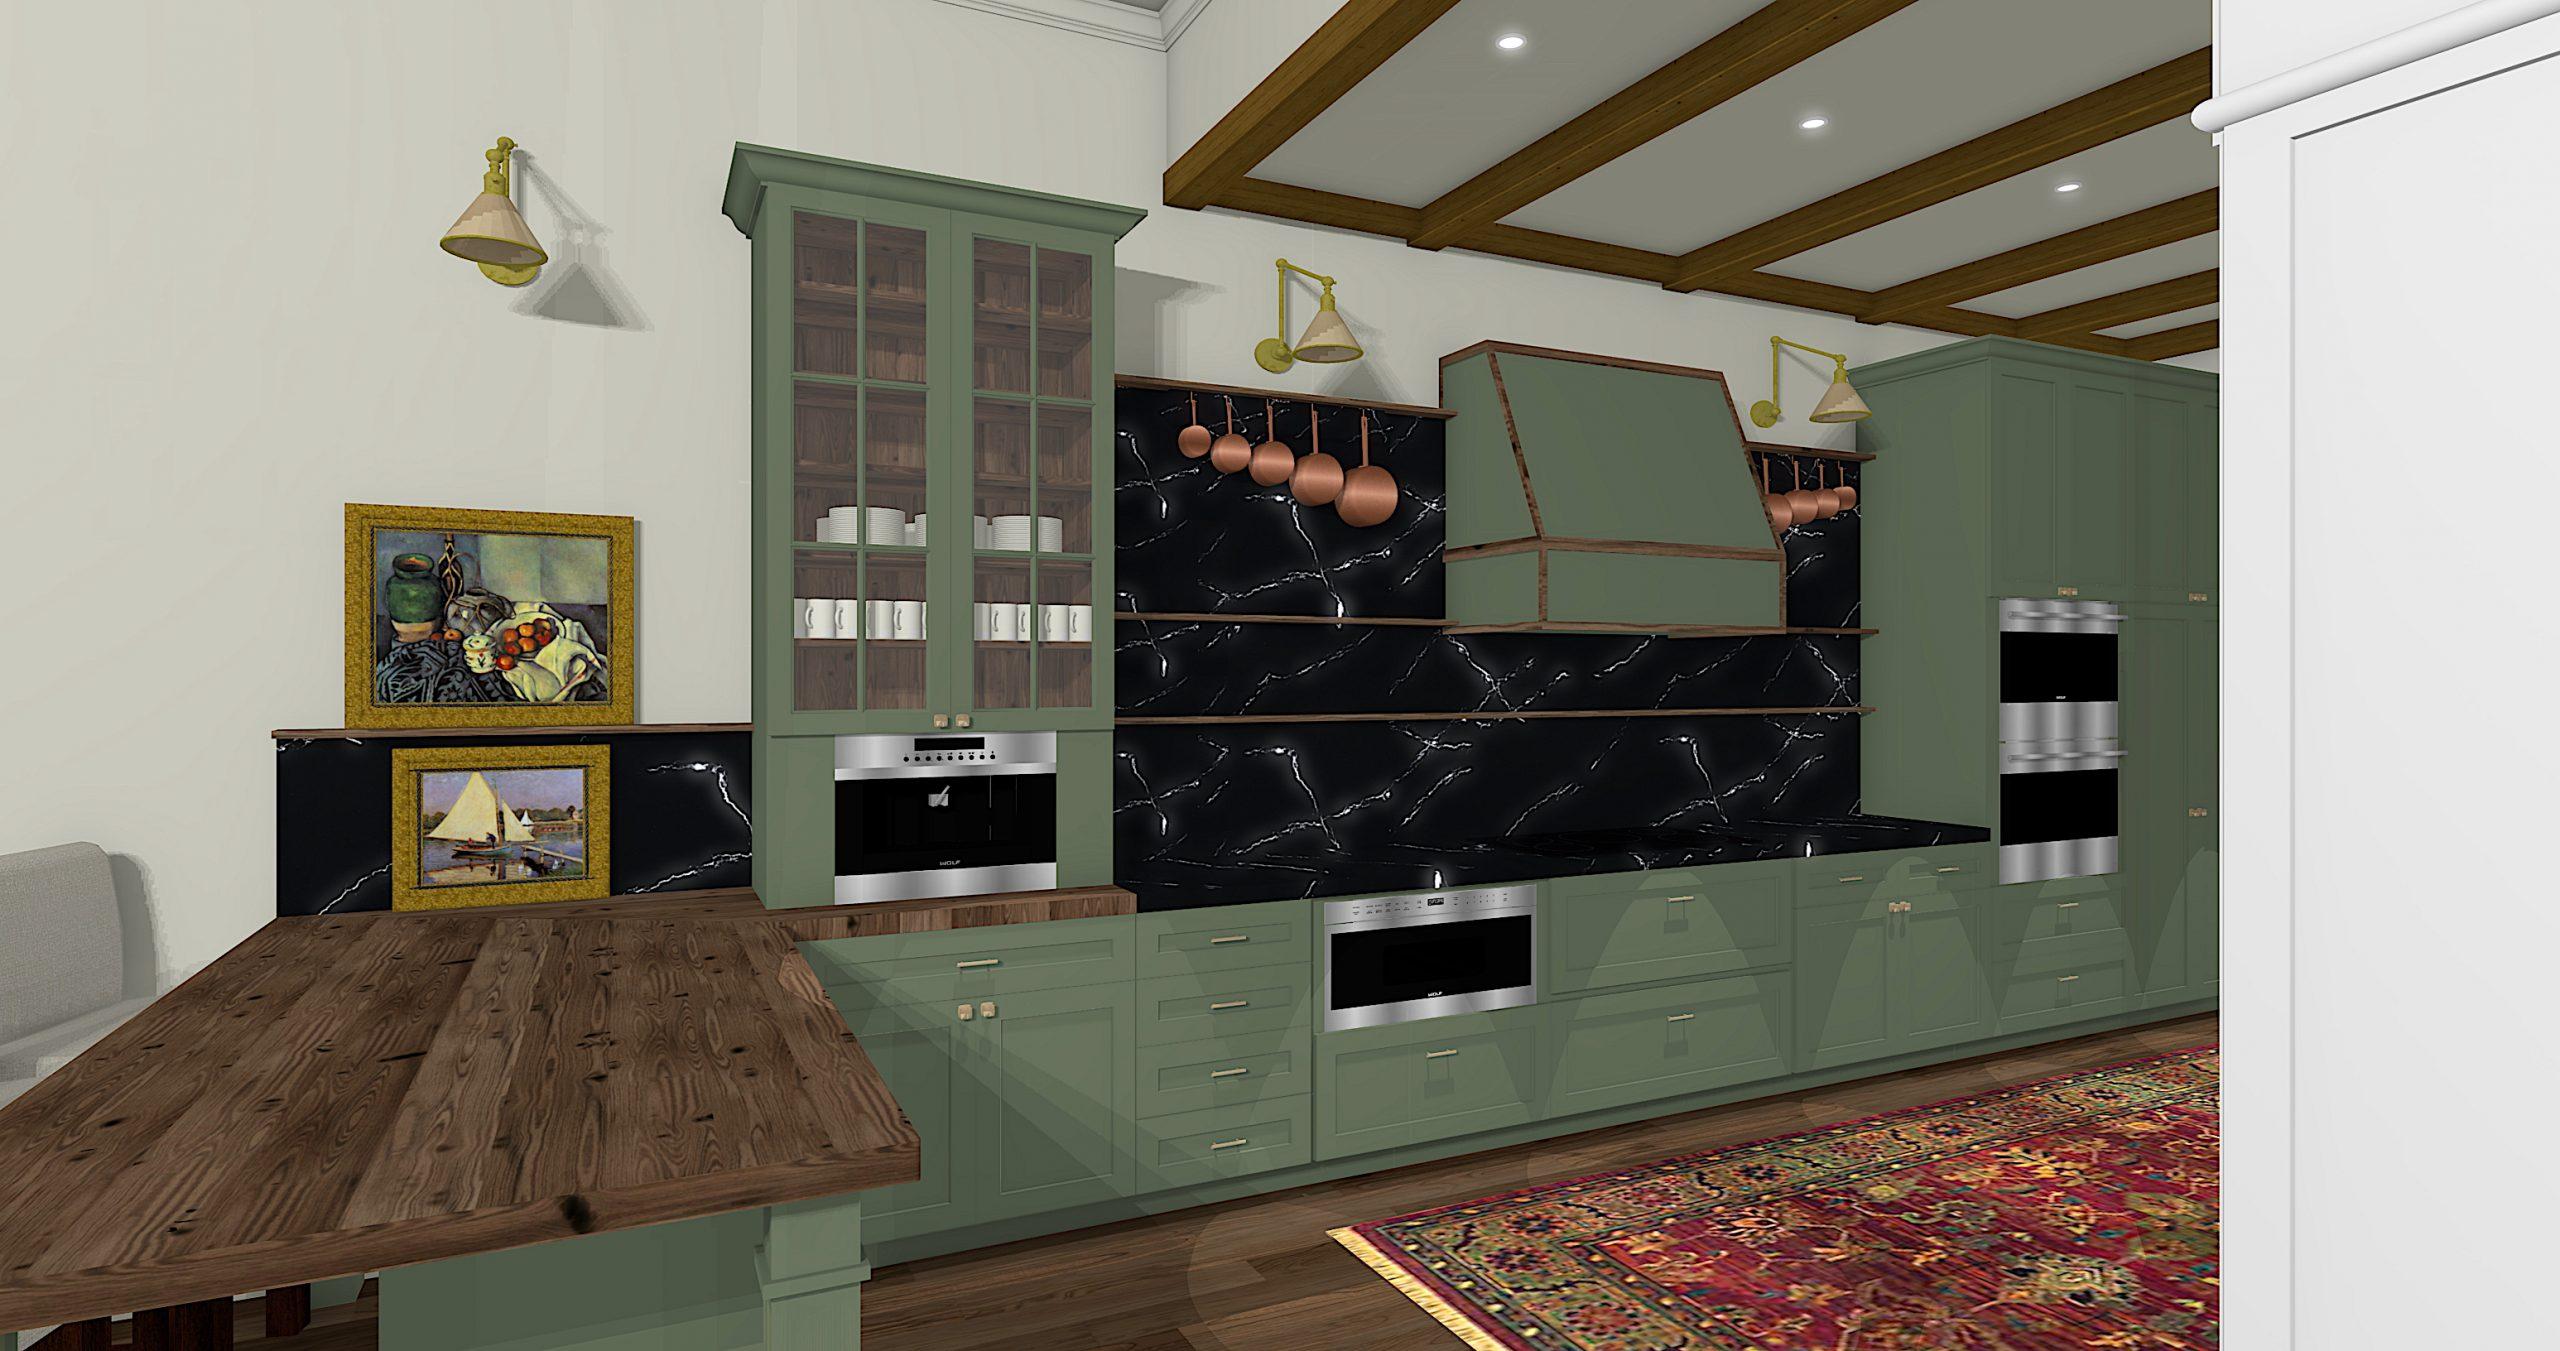 Linda Merrill Dream Home Kitchen in process soulful kitchen